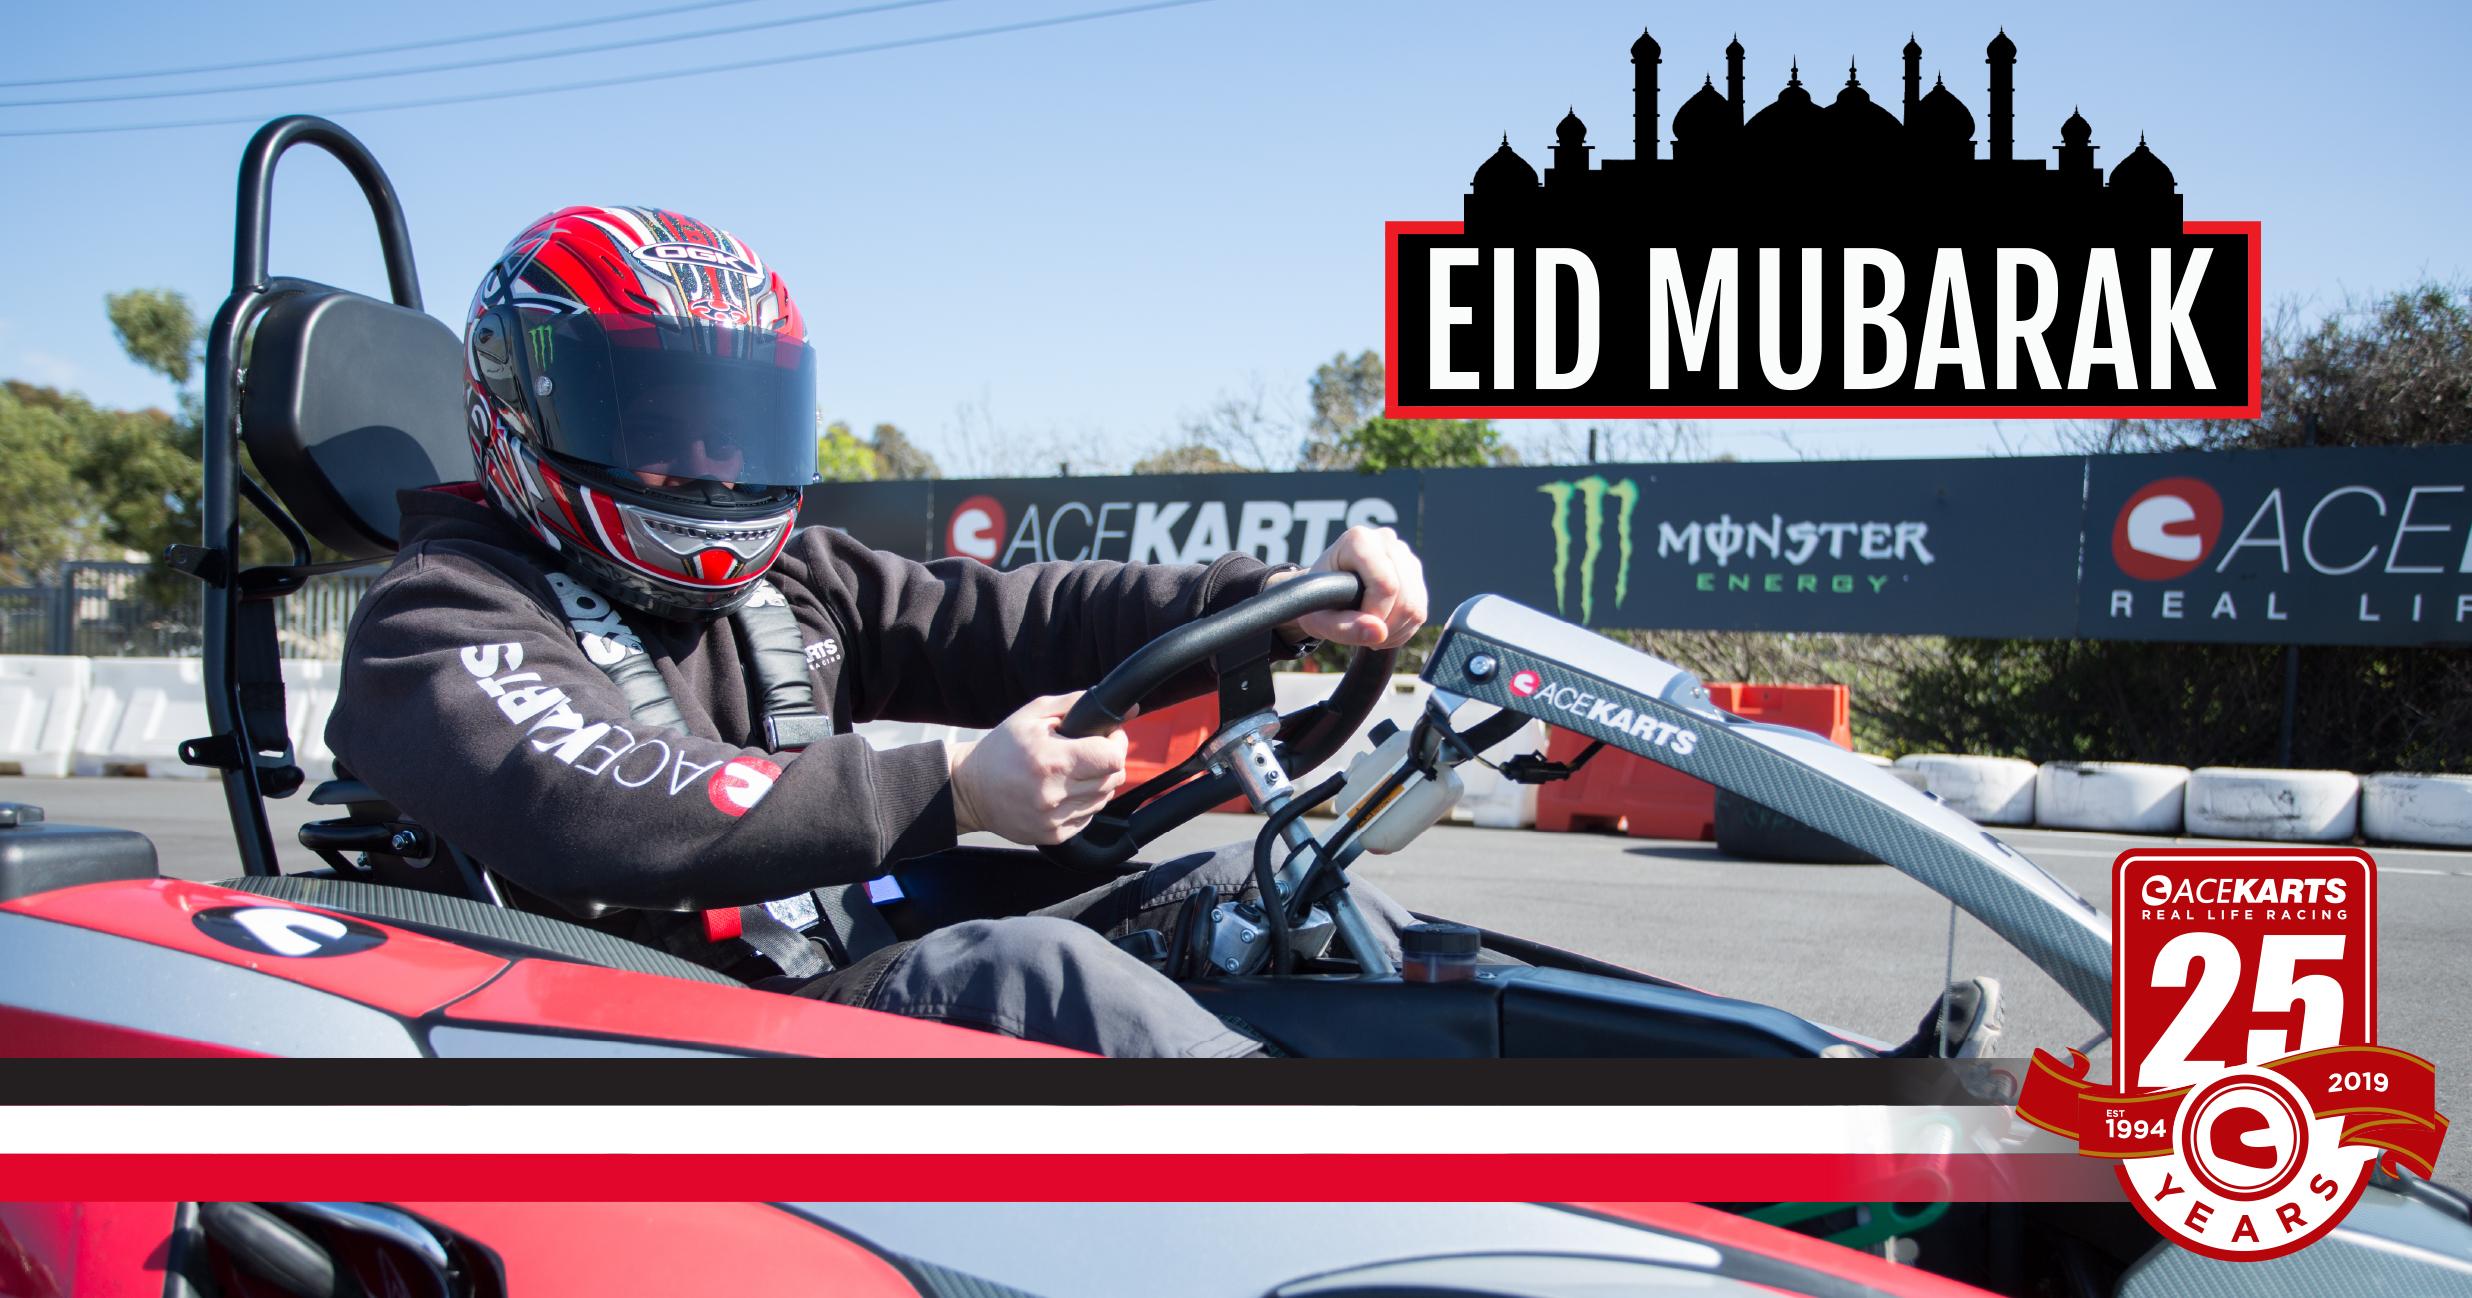 Outdoor Go Karting | Race Options | Book Online | Ace Karts